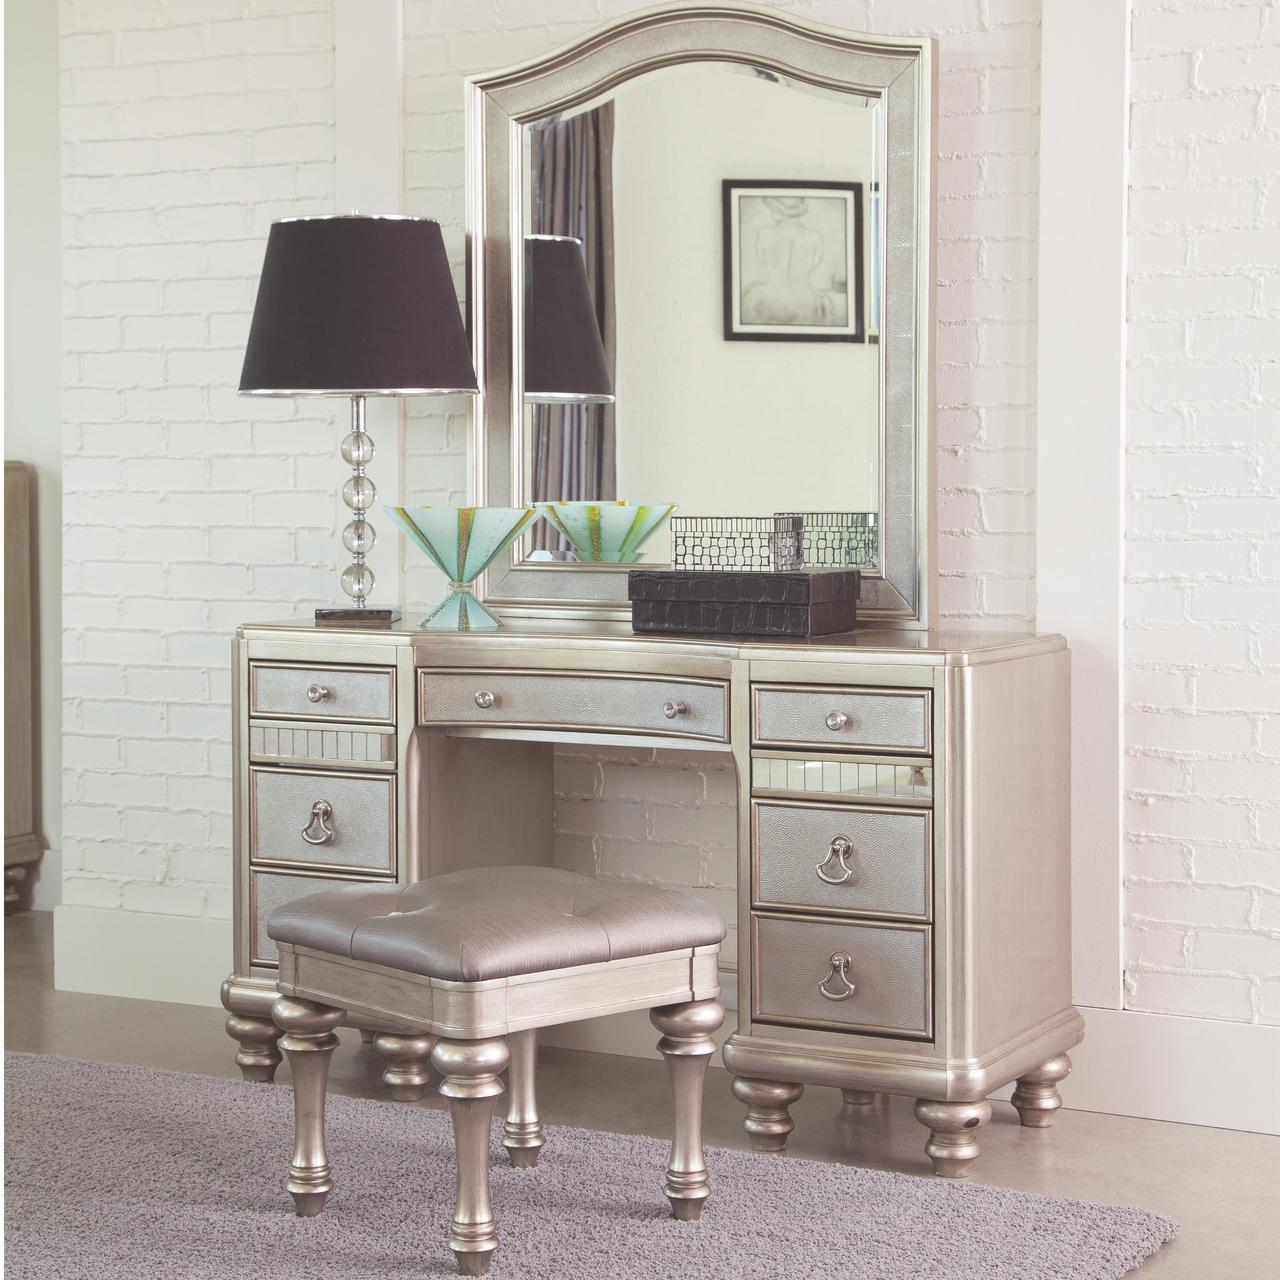 Lex Metallic Platinum Dressing Makeup Table with Drawers Mirror